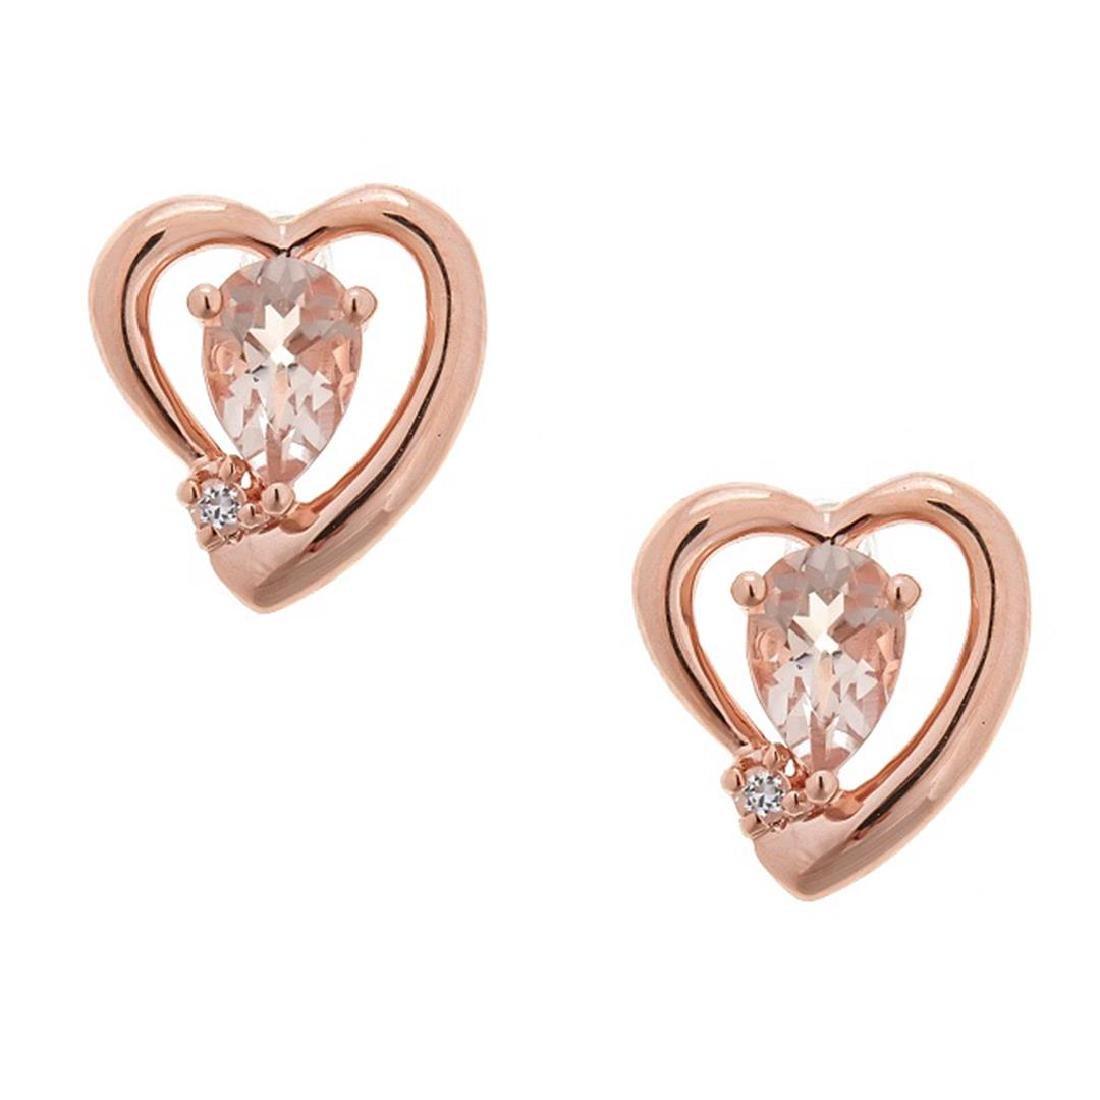 0.68 ctw Morganite and Diamond Earrings - 14KT Rose